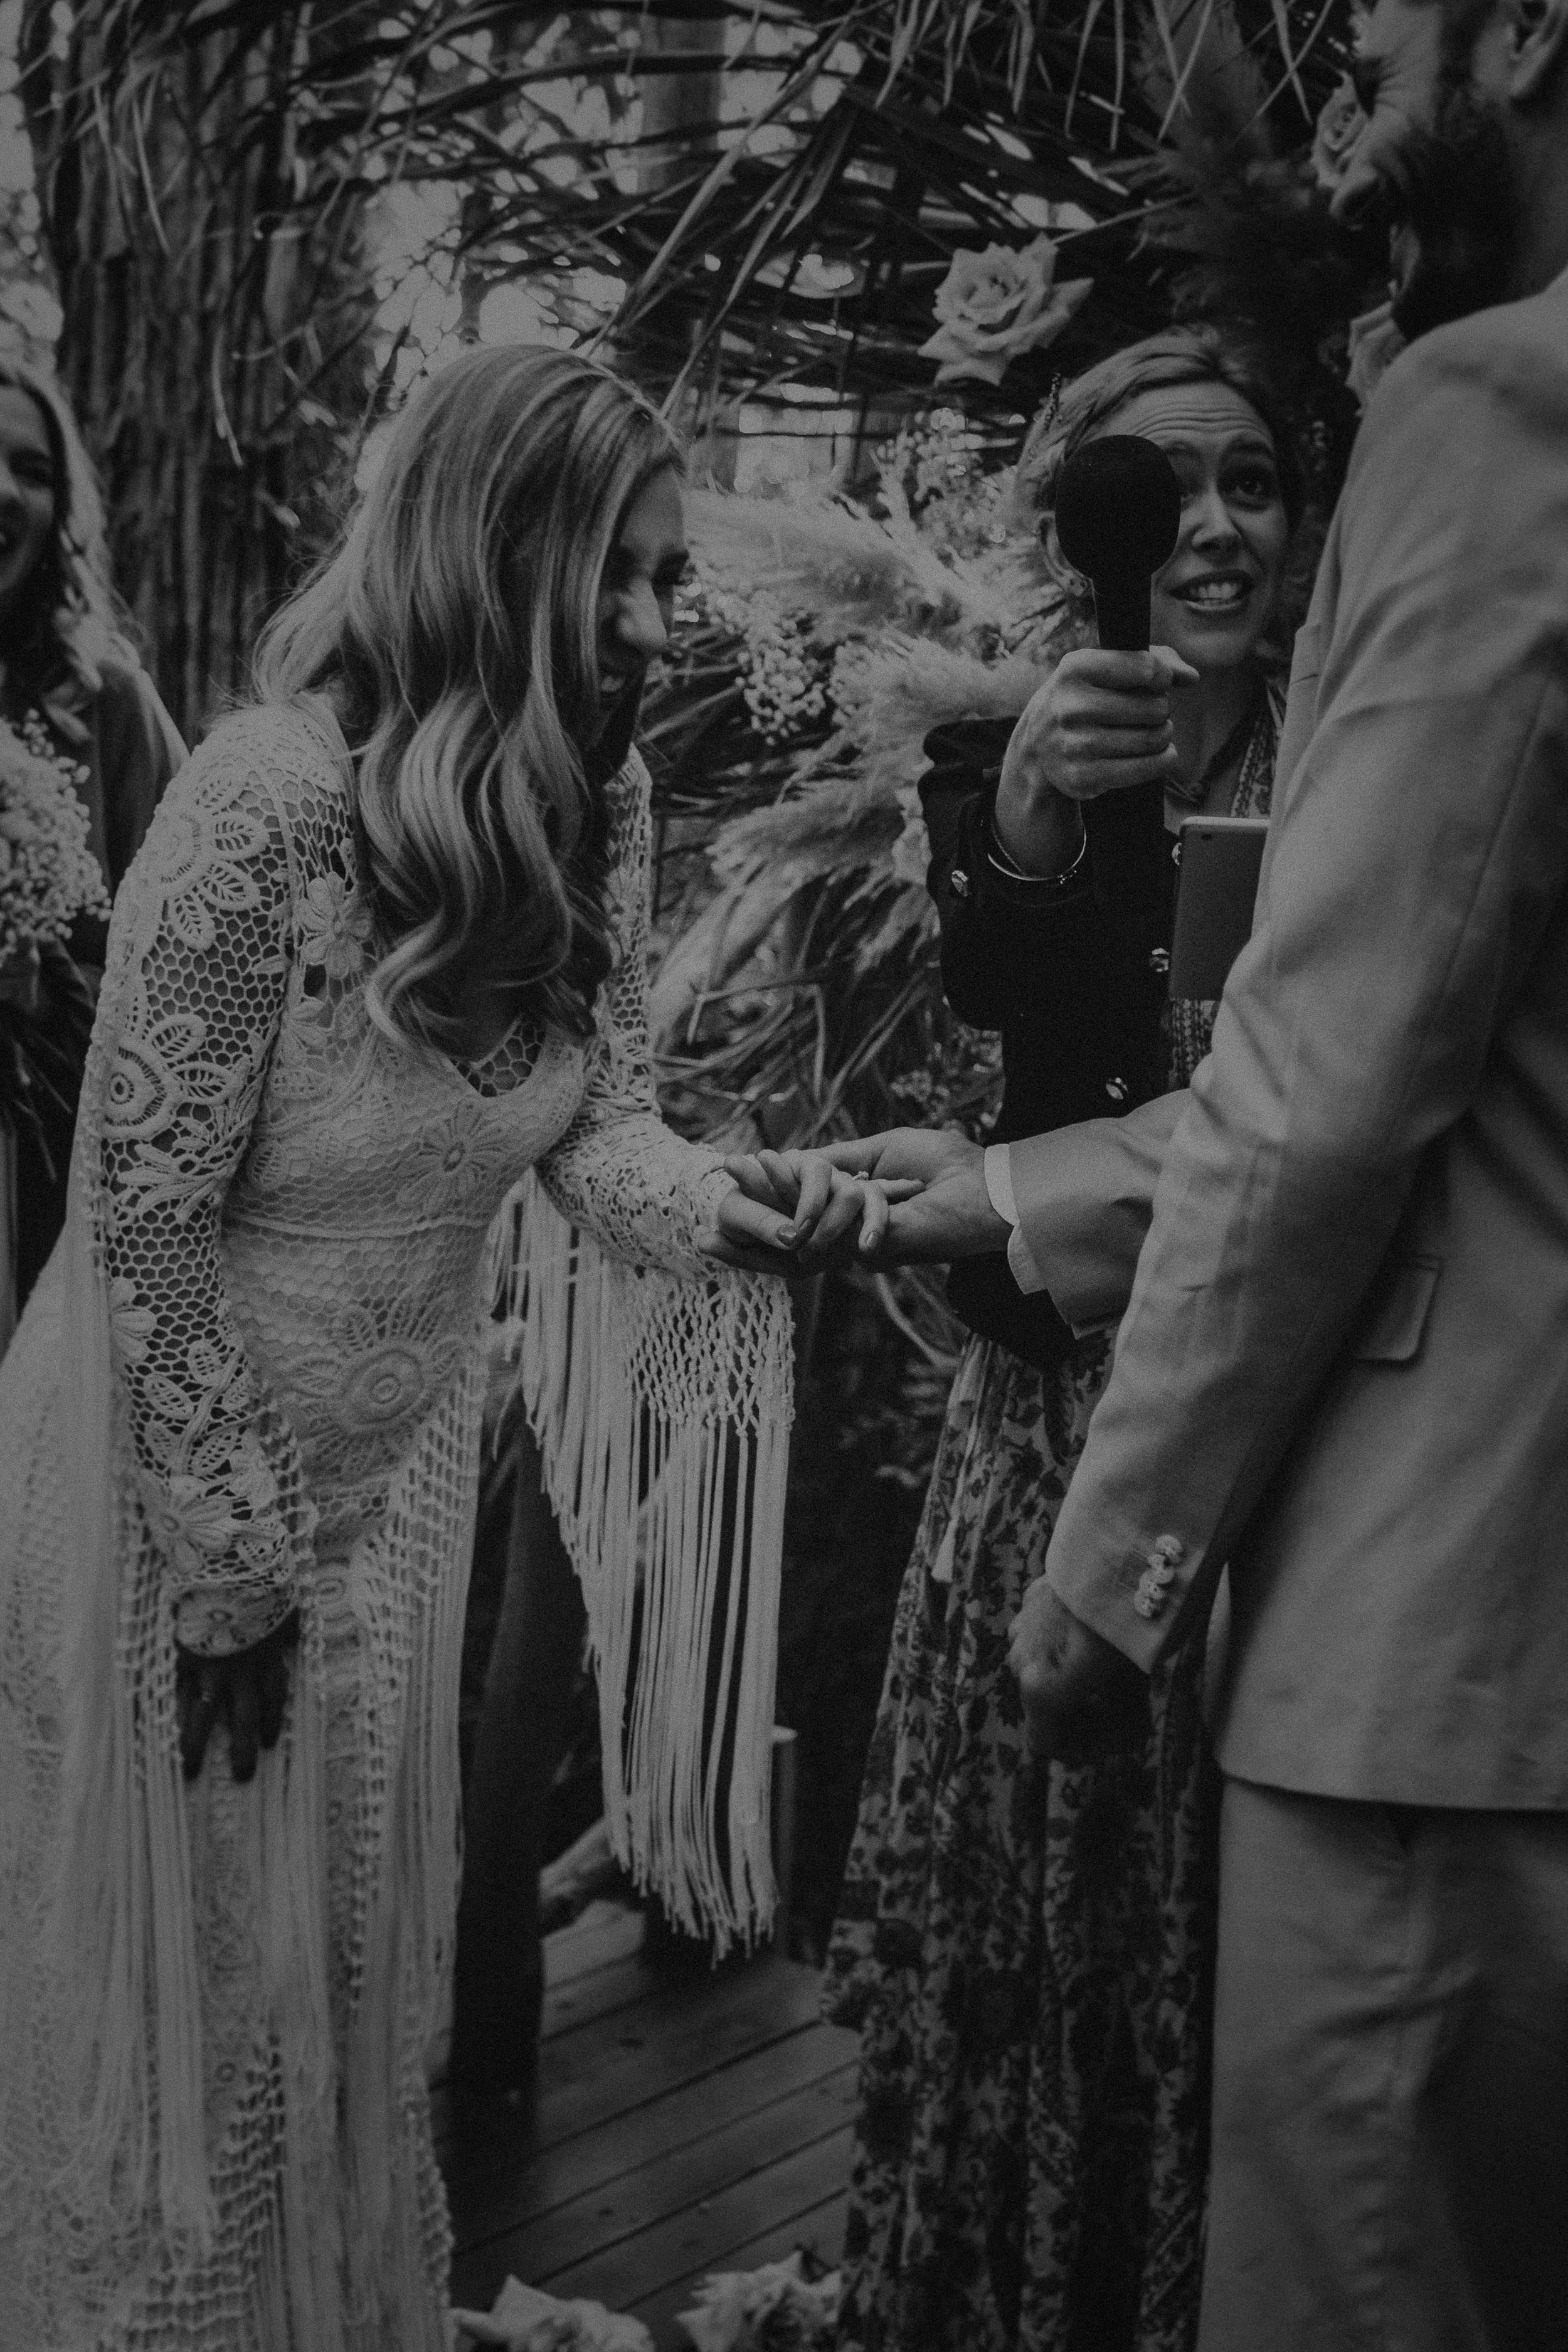 S&A Elopement - Kings & Thieves - Shred 'Til Dead - Central Coast Beach Forest Wedding - 213.jpg